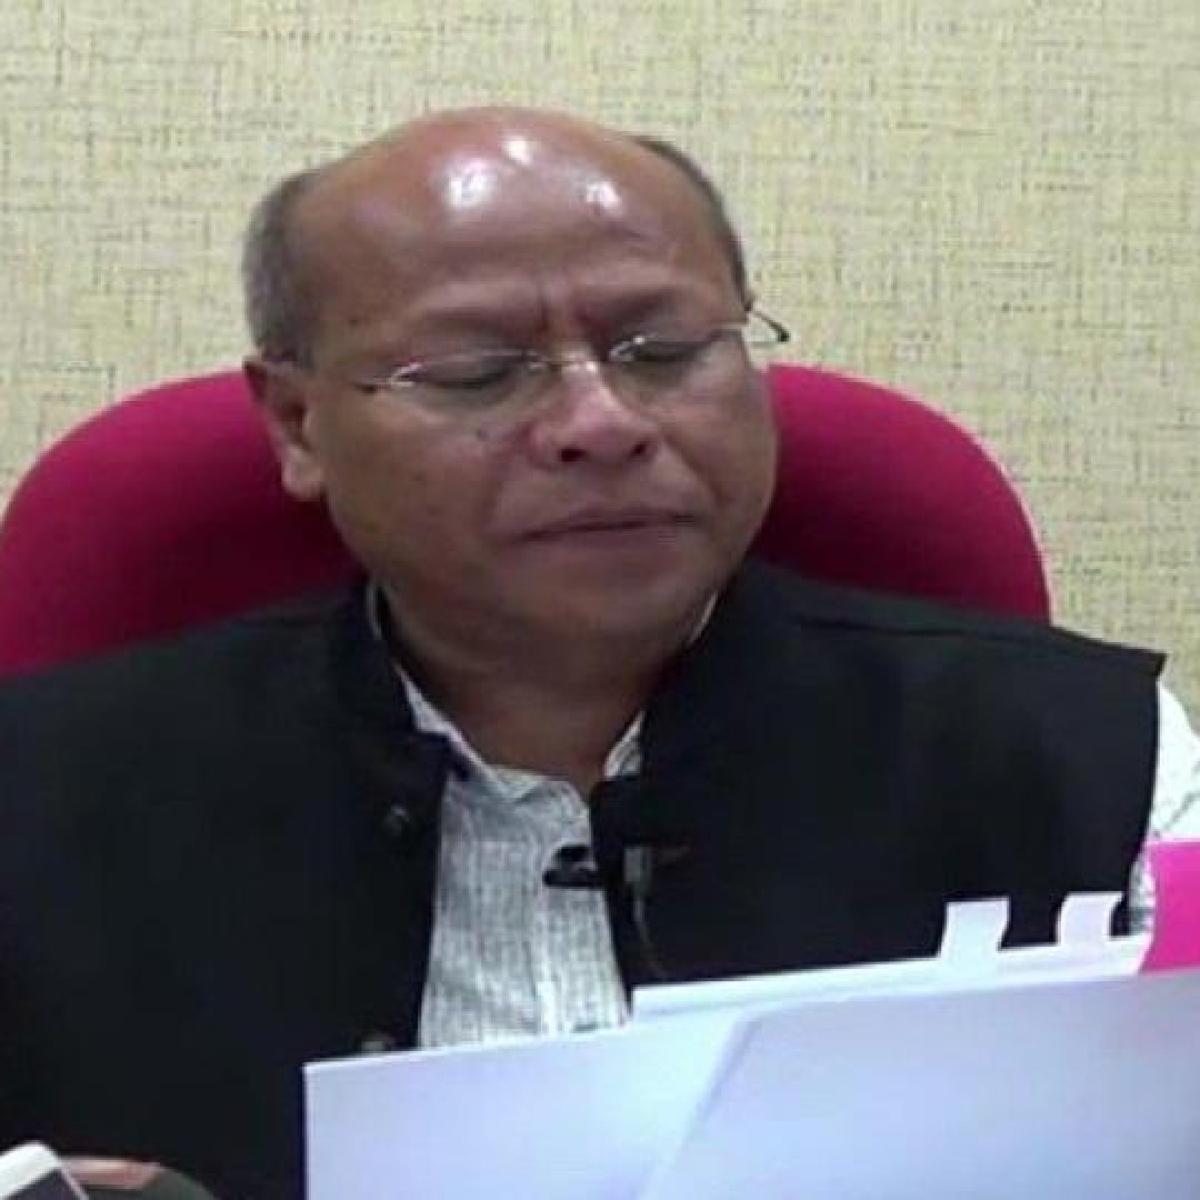 Meghalaya readies resolution seeking ILP in state